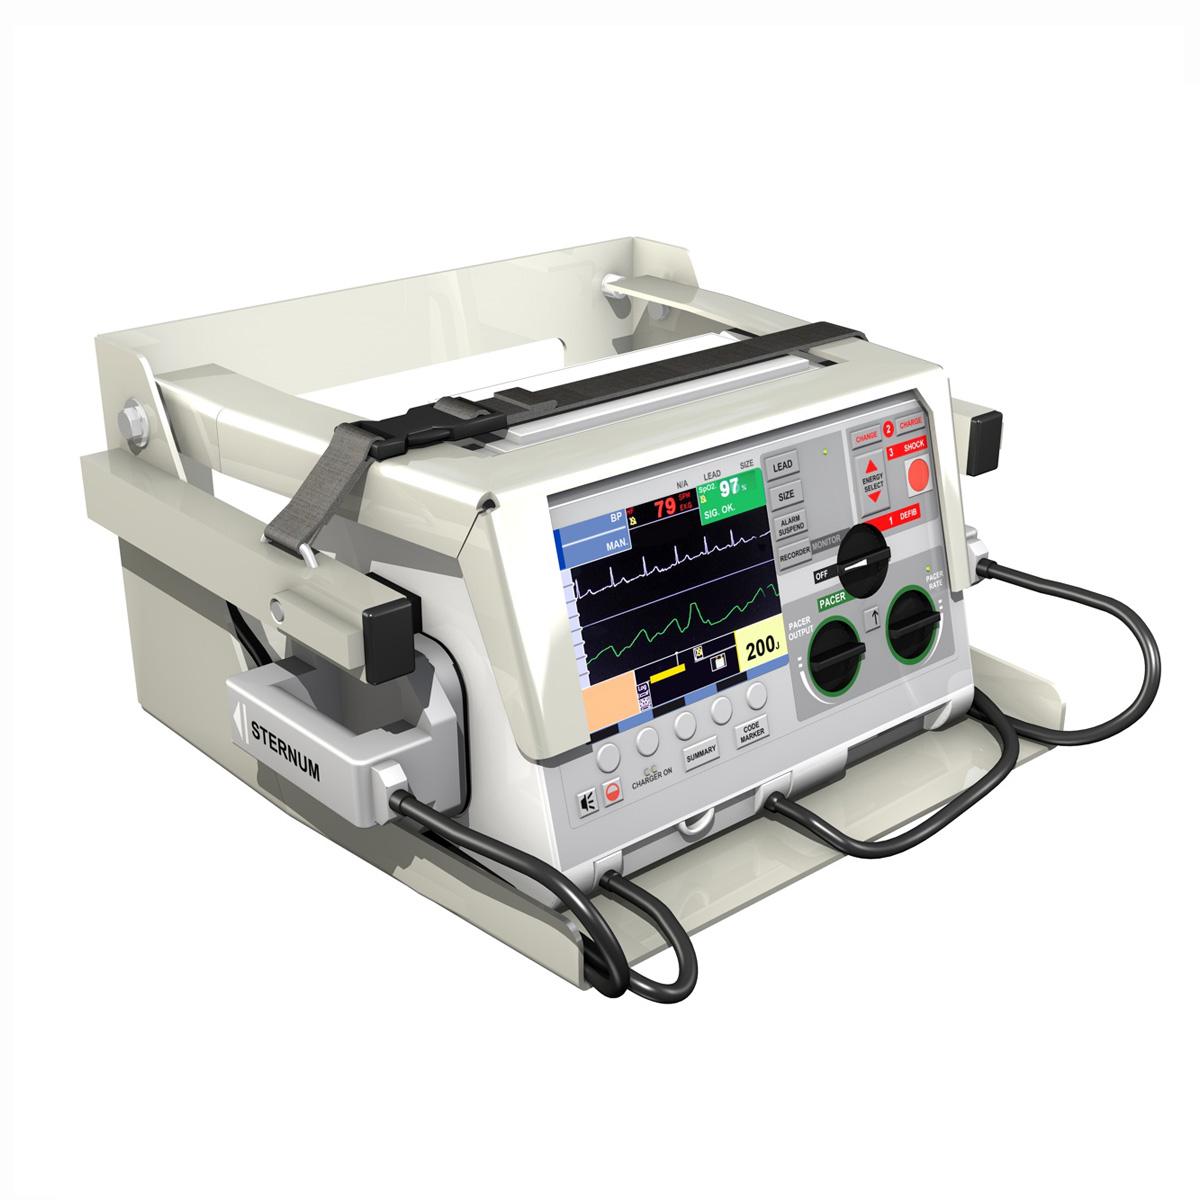 defibrillator 3d model 3ds c4d lwo obj 264207